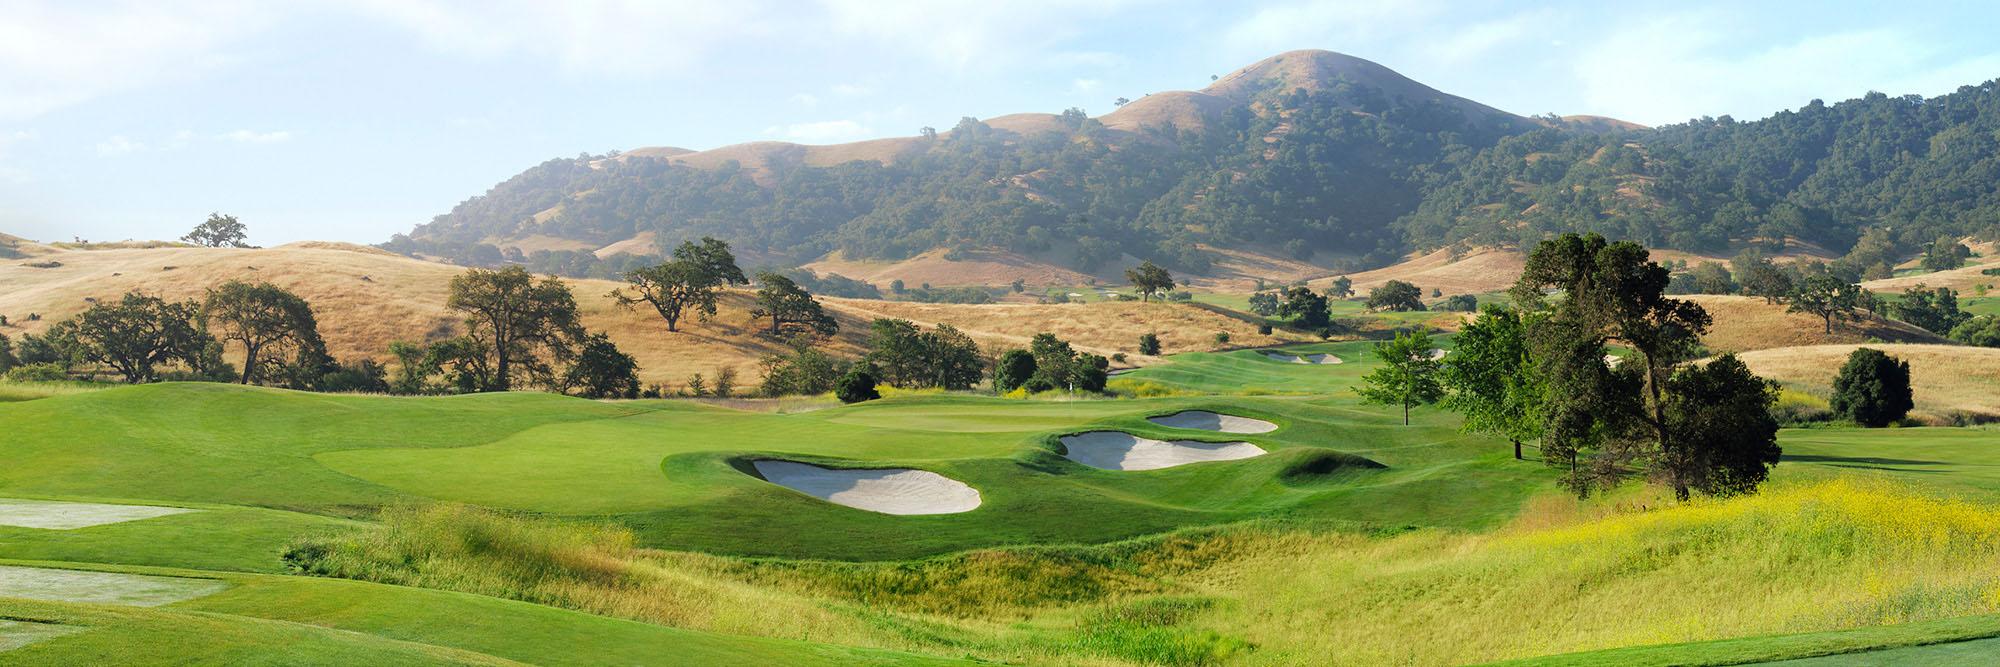 Golf Course Image - CordeValle Golf Club No. 7